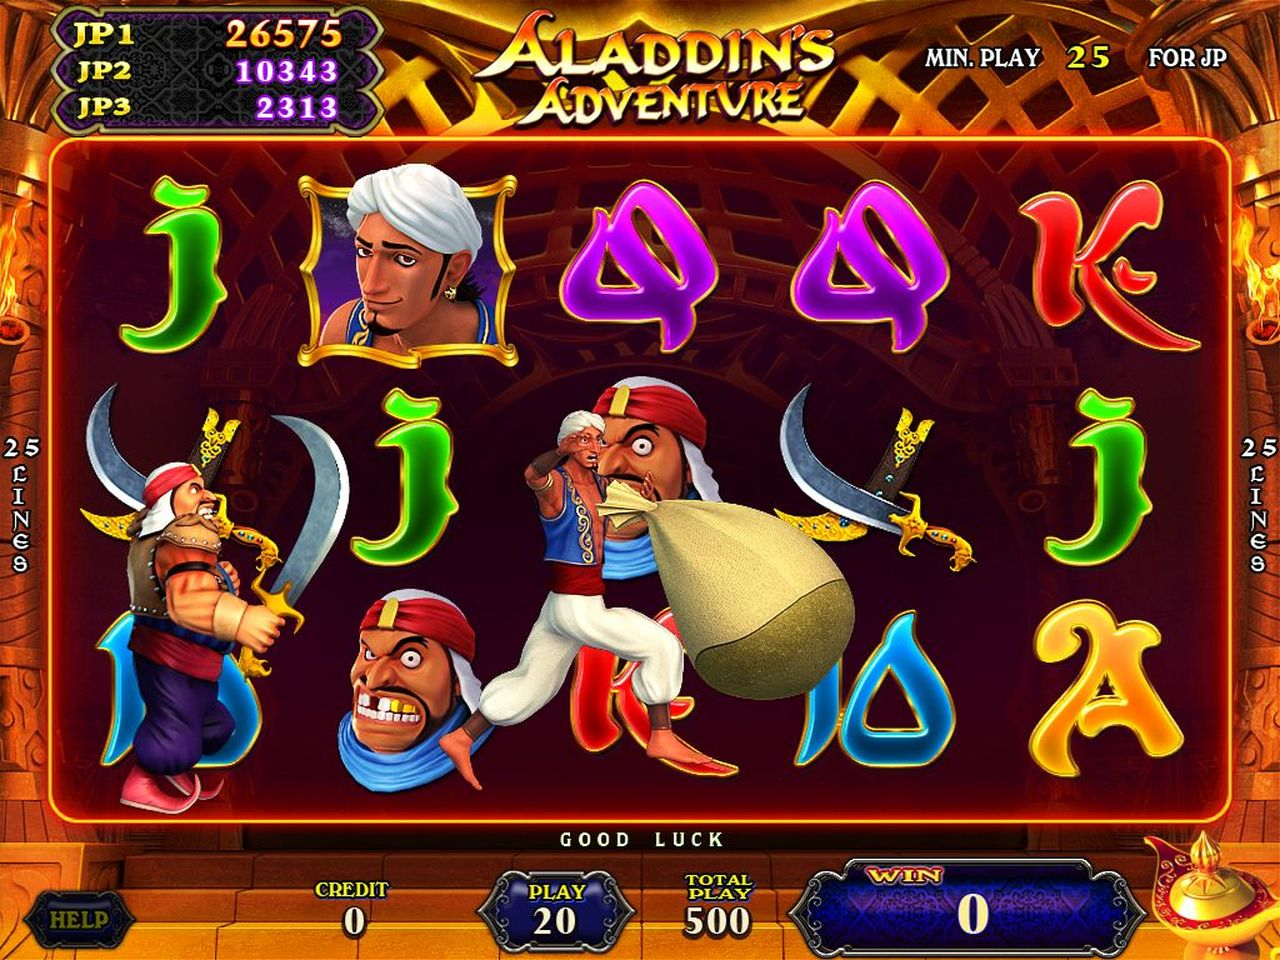 Aladdin's Adventure